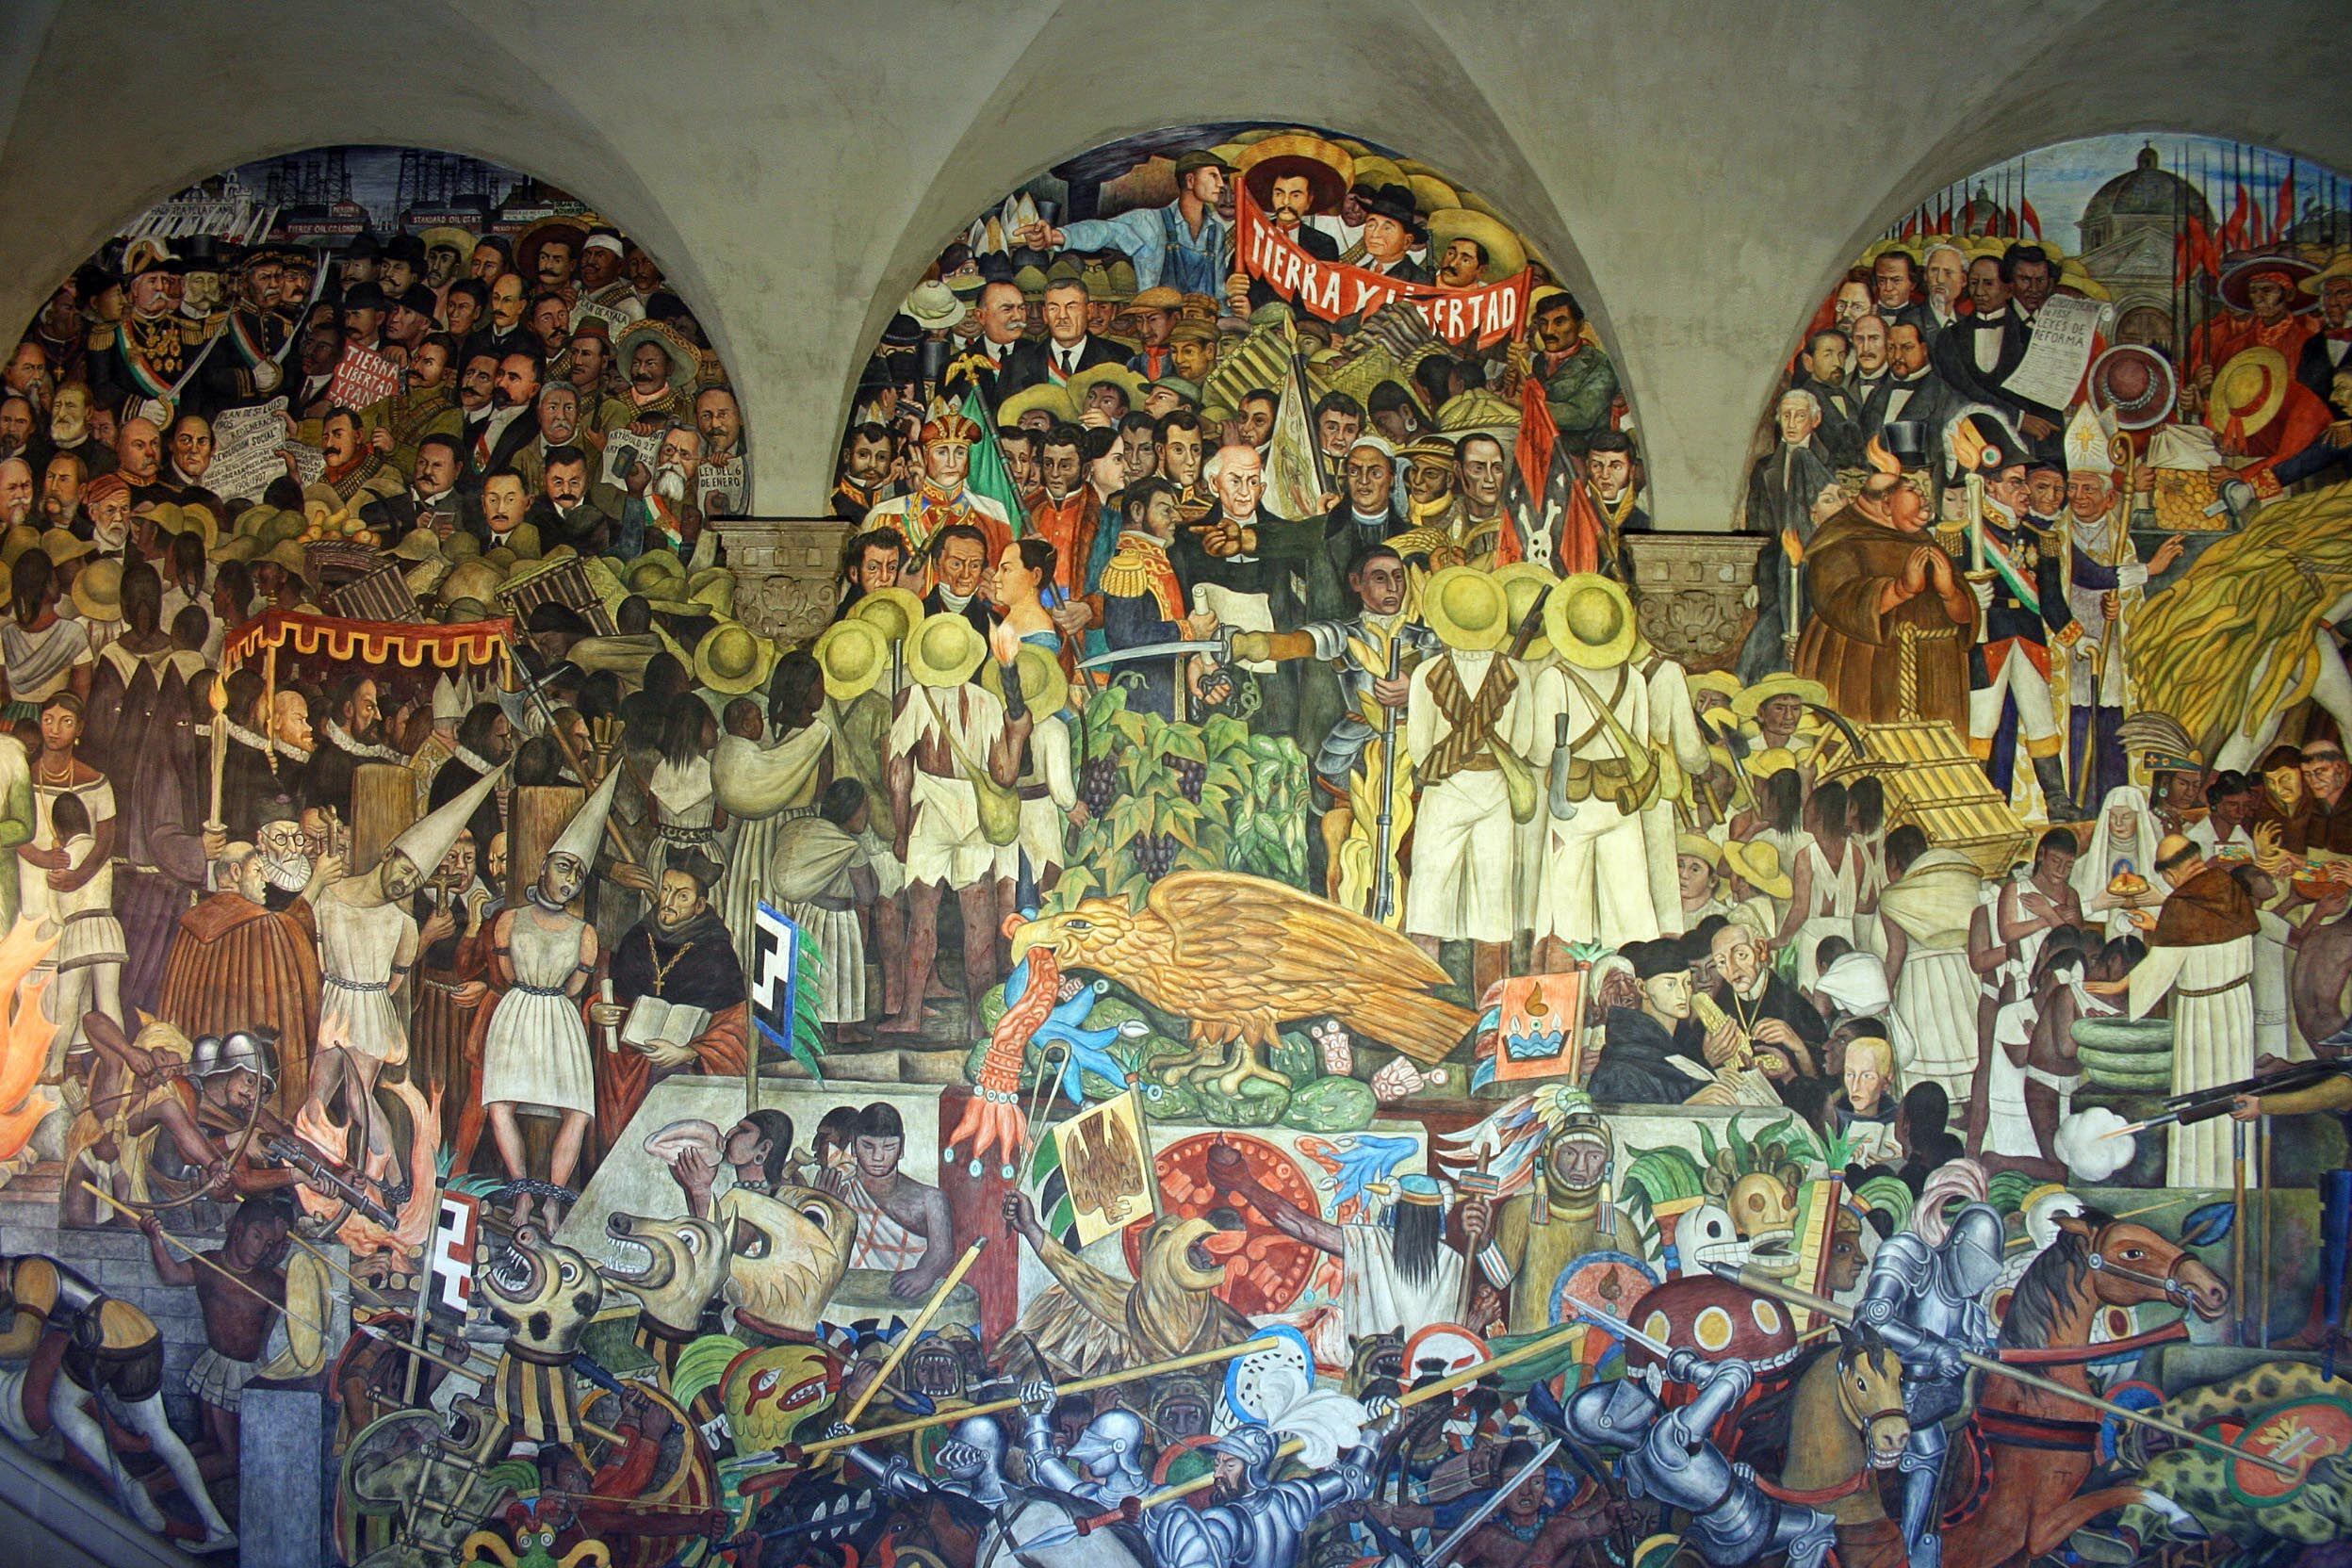 Diego Rivera Mural Mexicano Historia De Mexico Forma De Ensenar